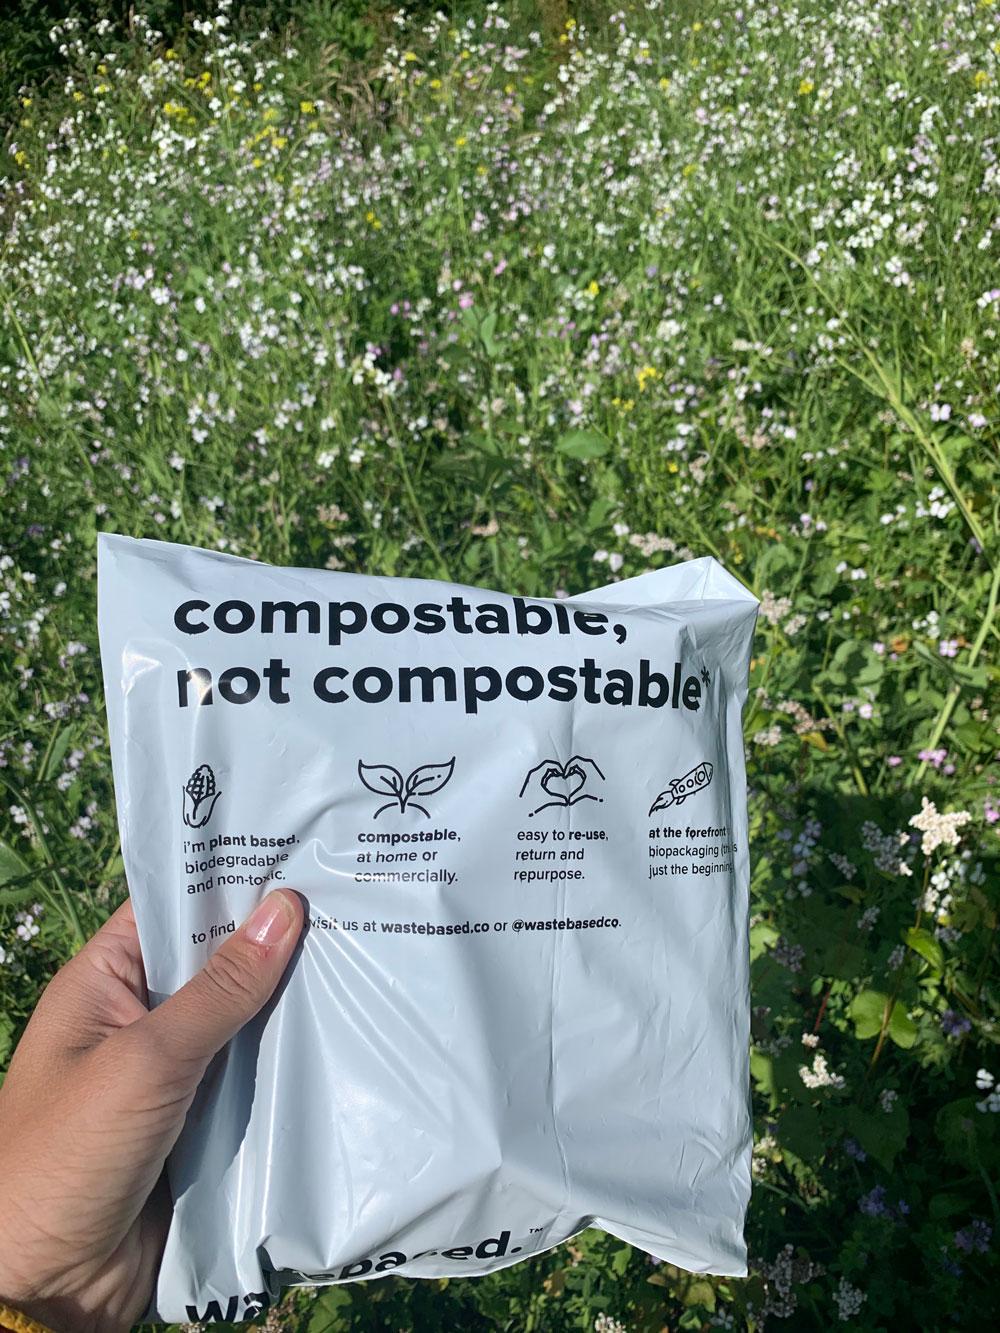 Graine Emballage Biodegradable